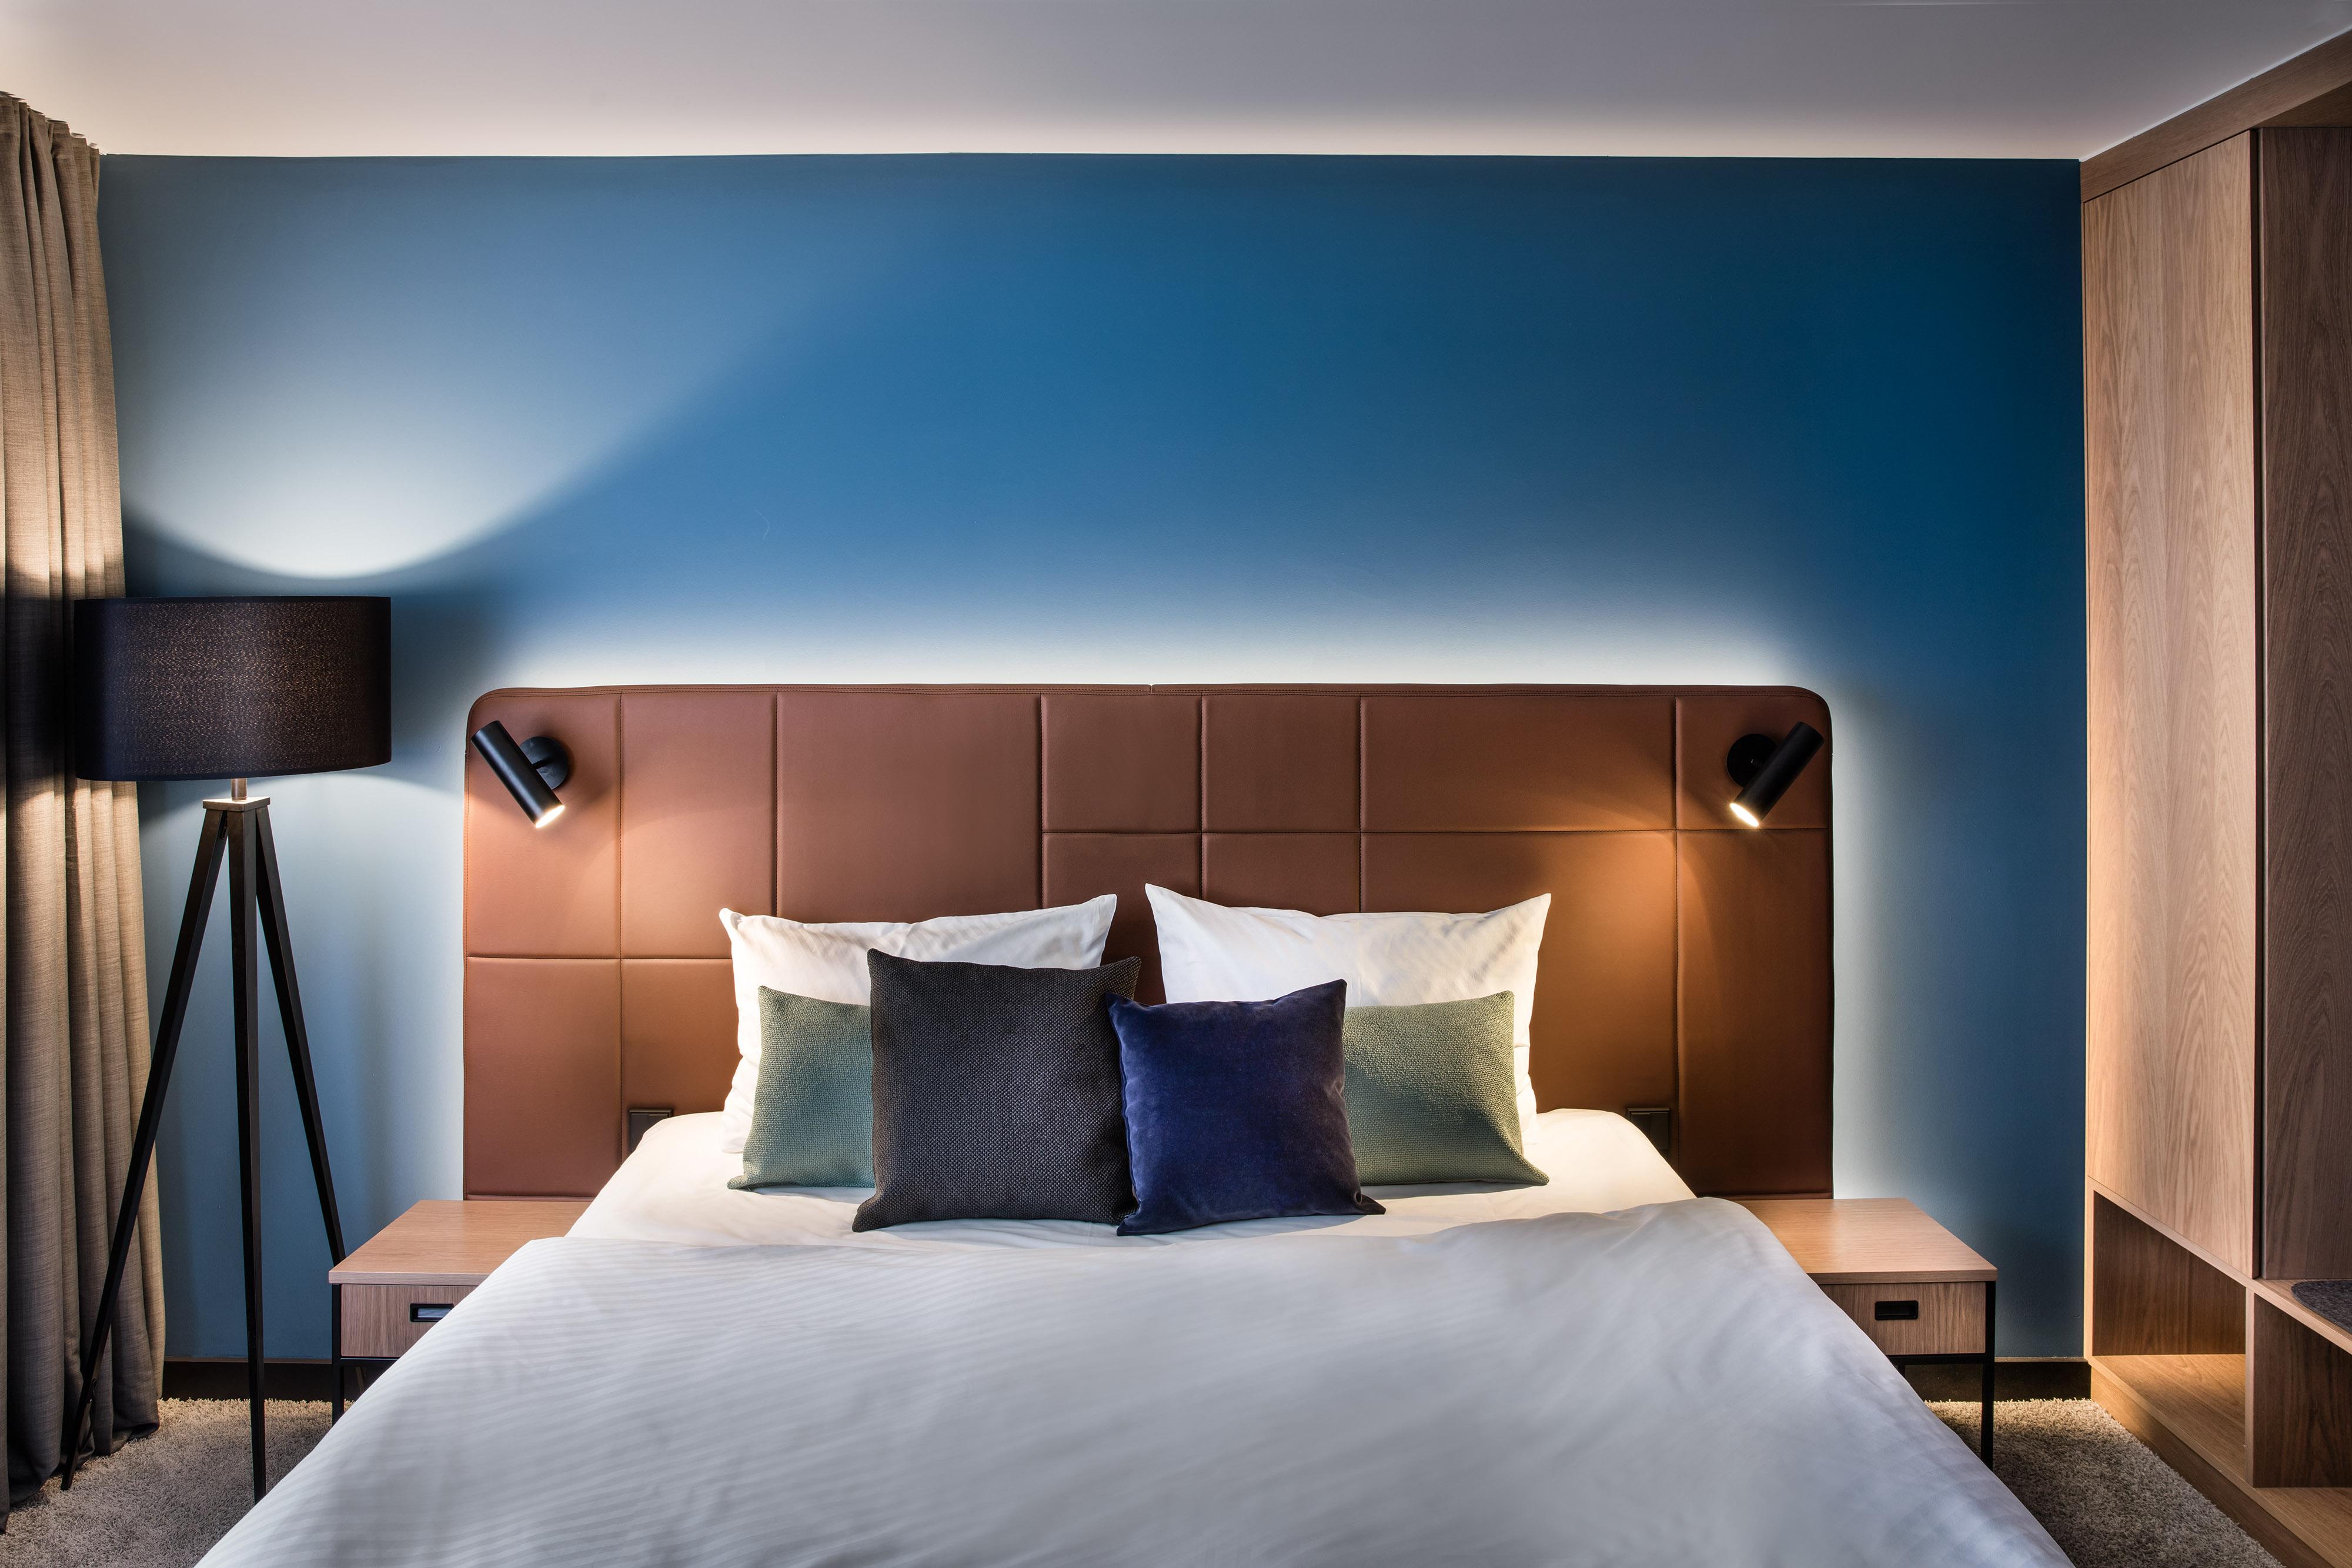 Hotel Domizil designed by Dittel Architekten | Design +